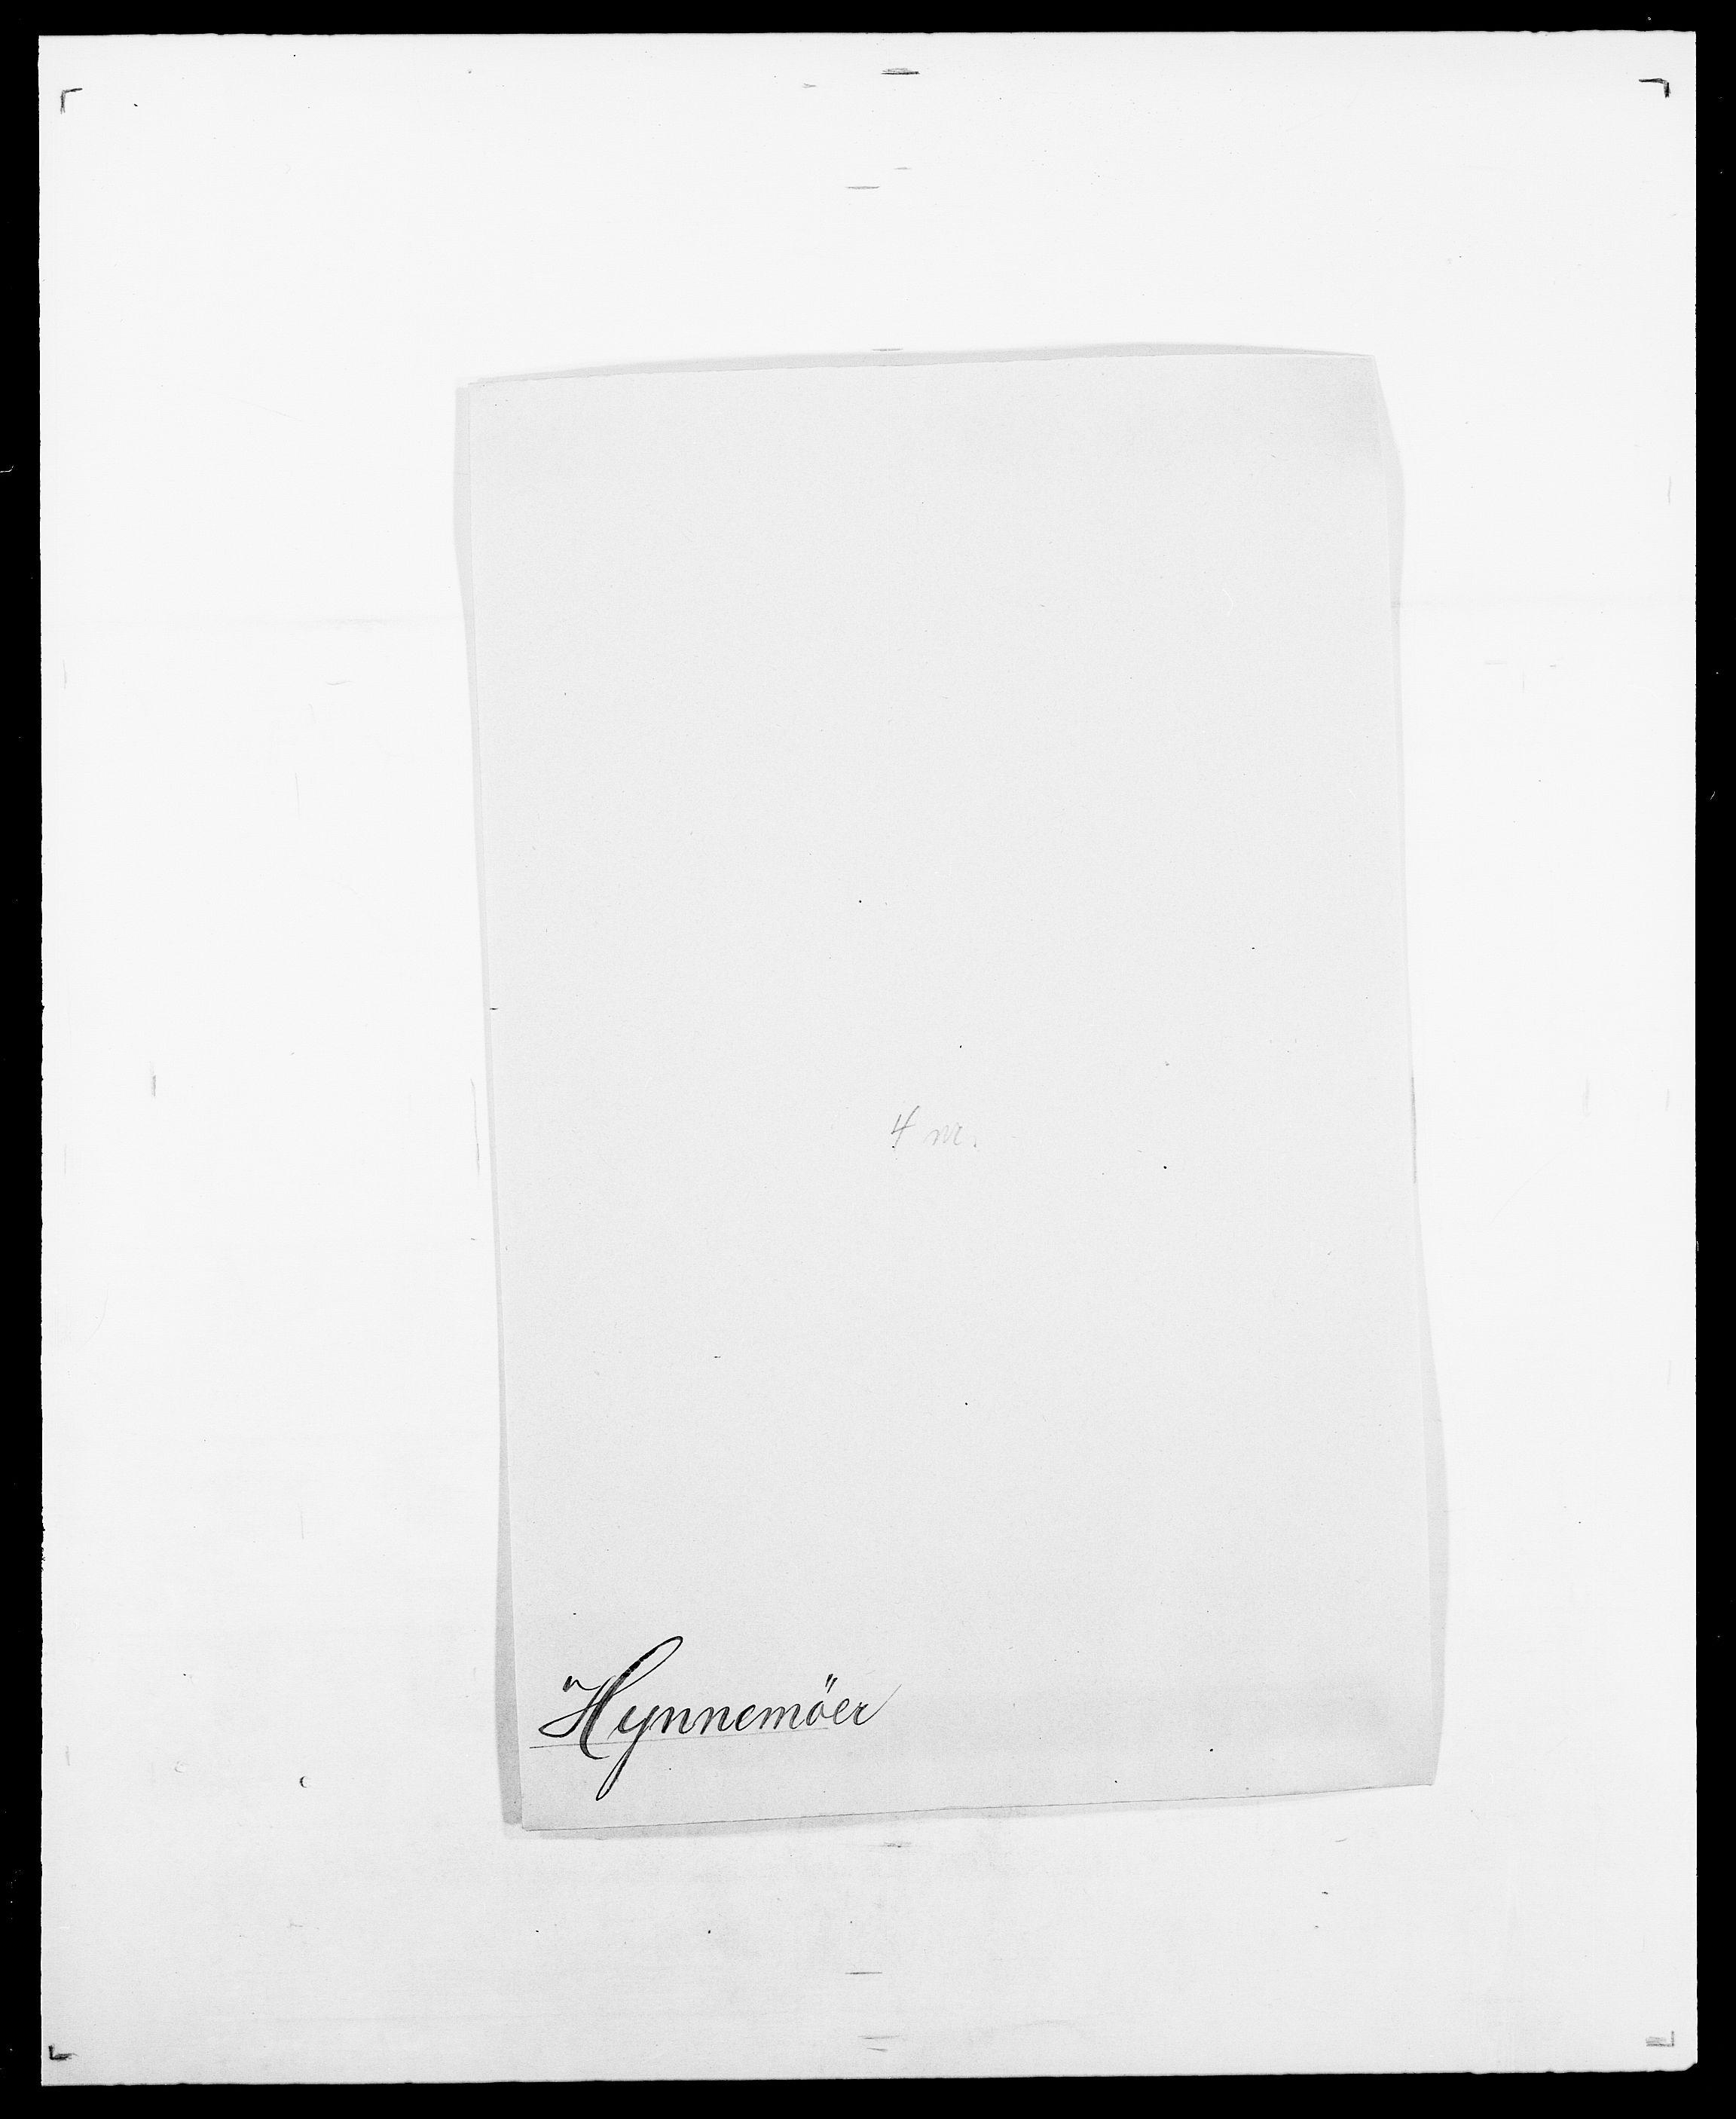 SAO, Delgobe, Charles Antoine - samling, D/Da/L0019: van der Hude - Joys, s. 284